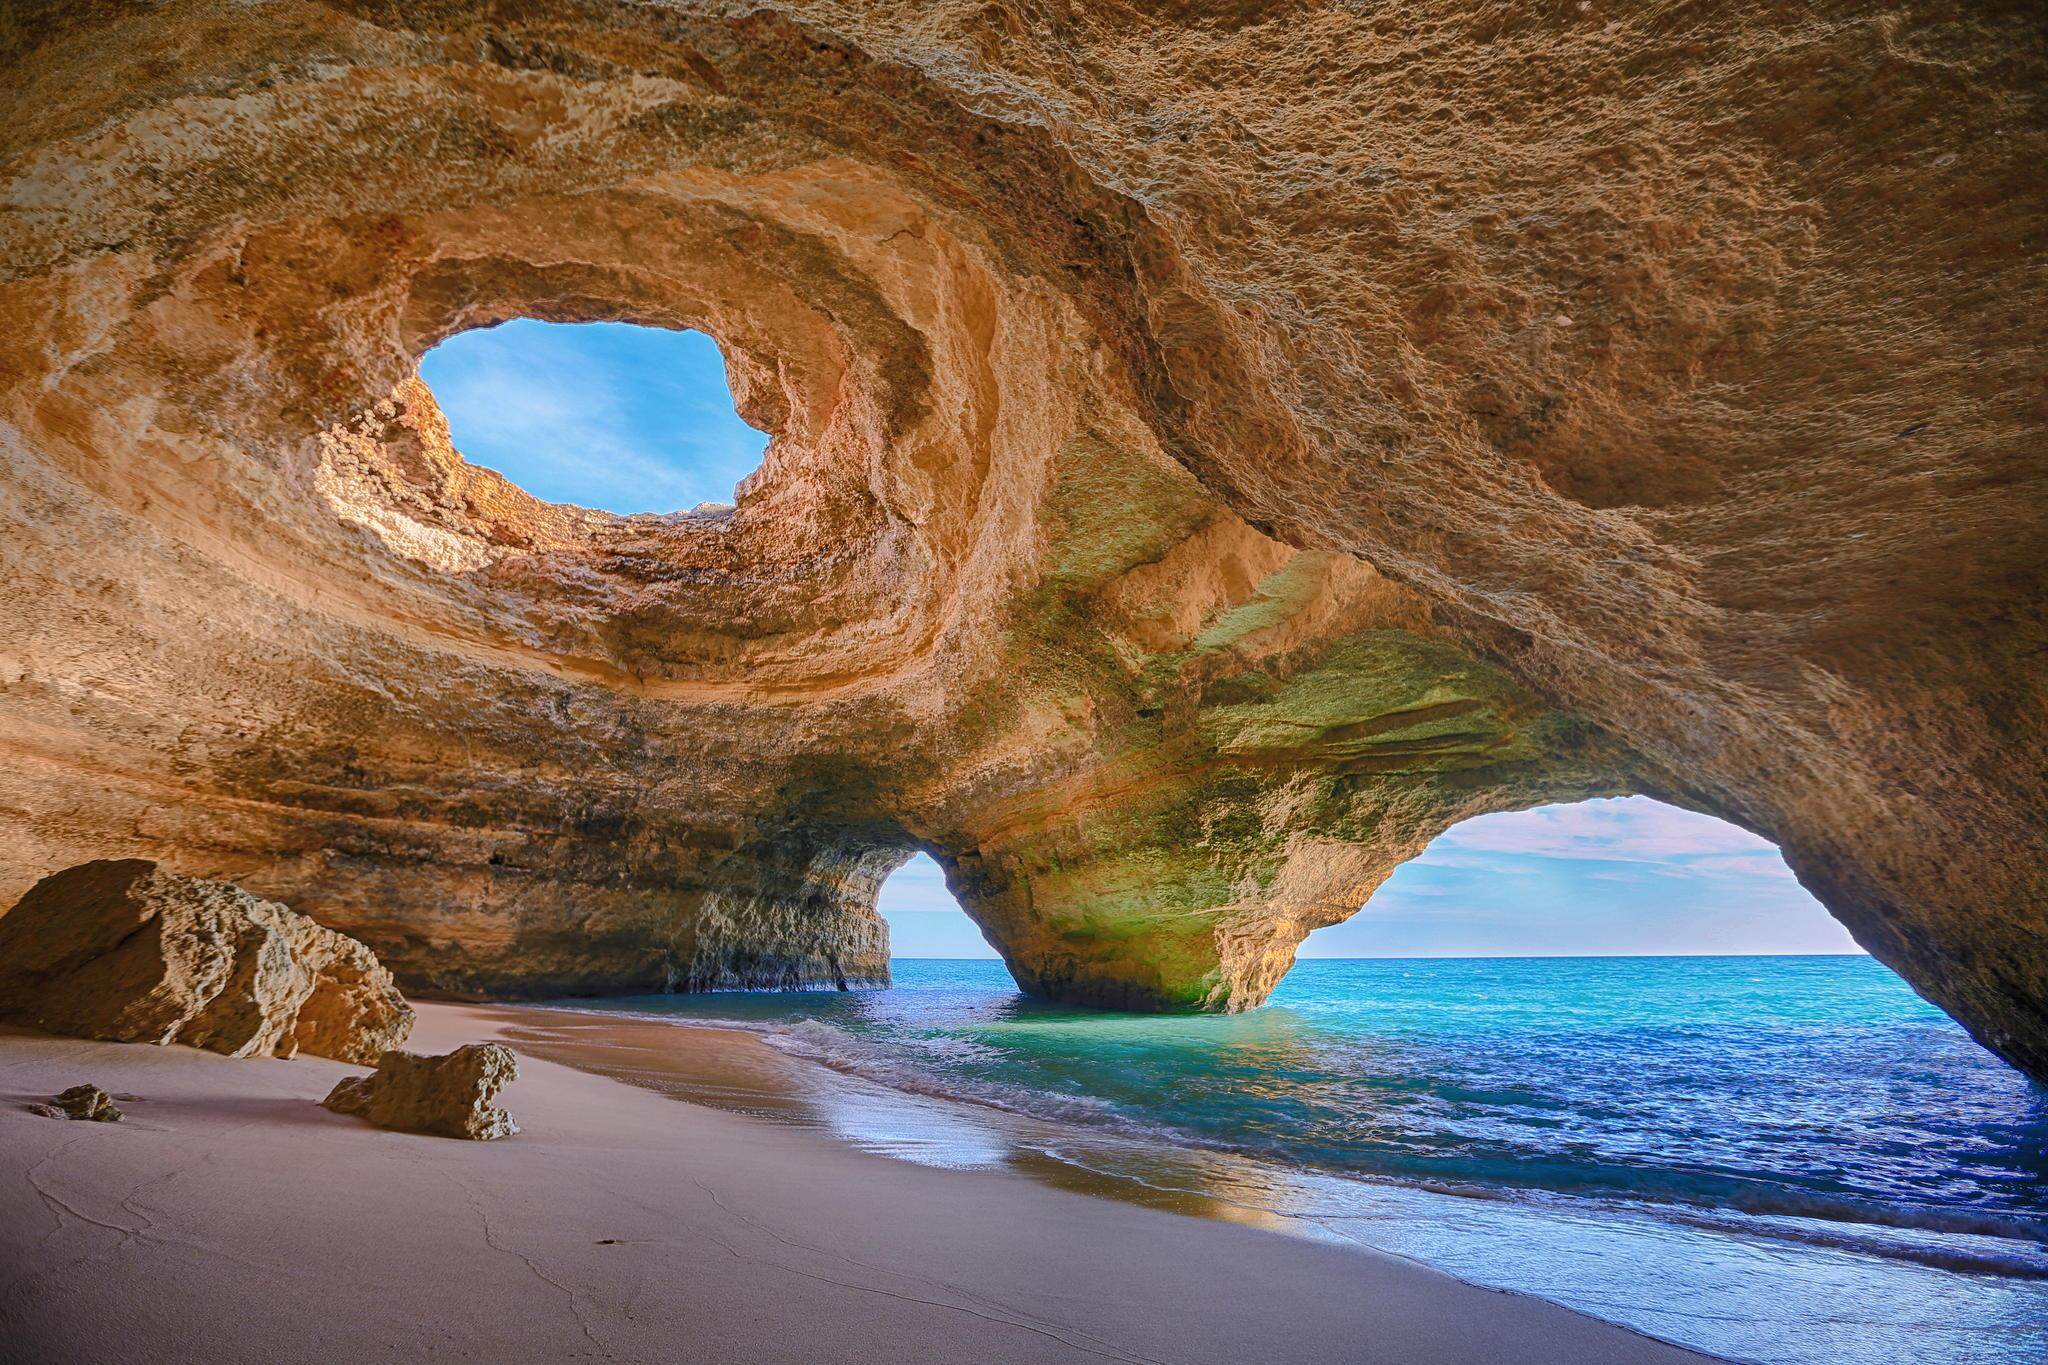 Coastal Rock Formation Wallpapers Wallpaper Cave Hd wallpaper cave rock formation nature